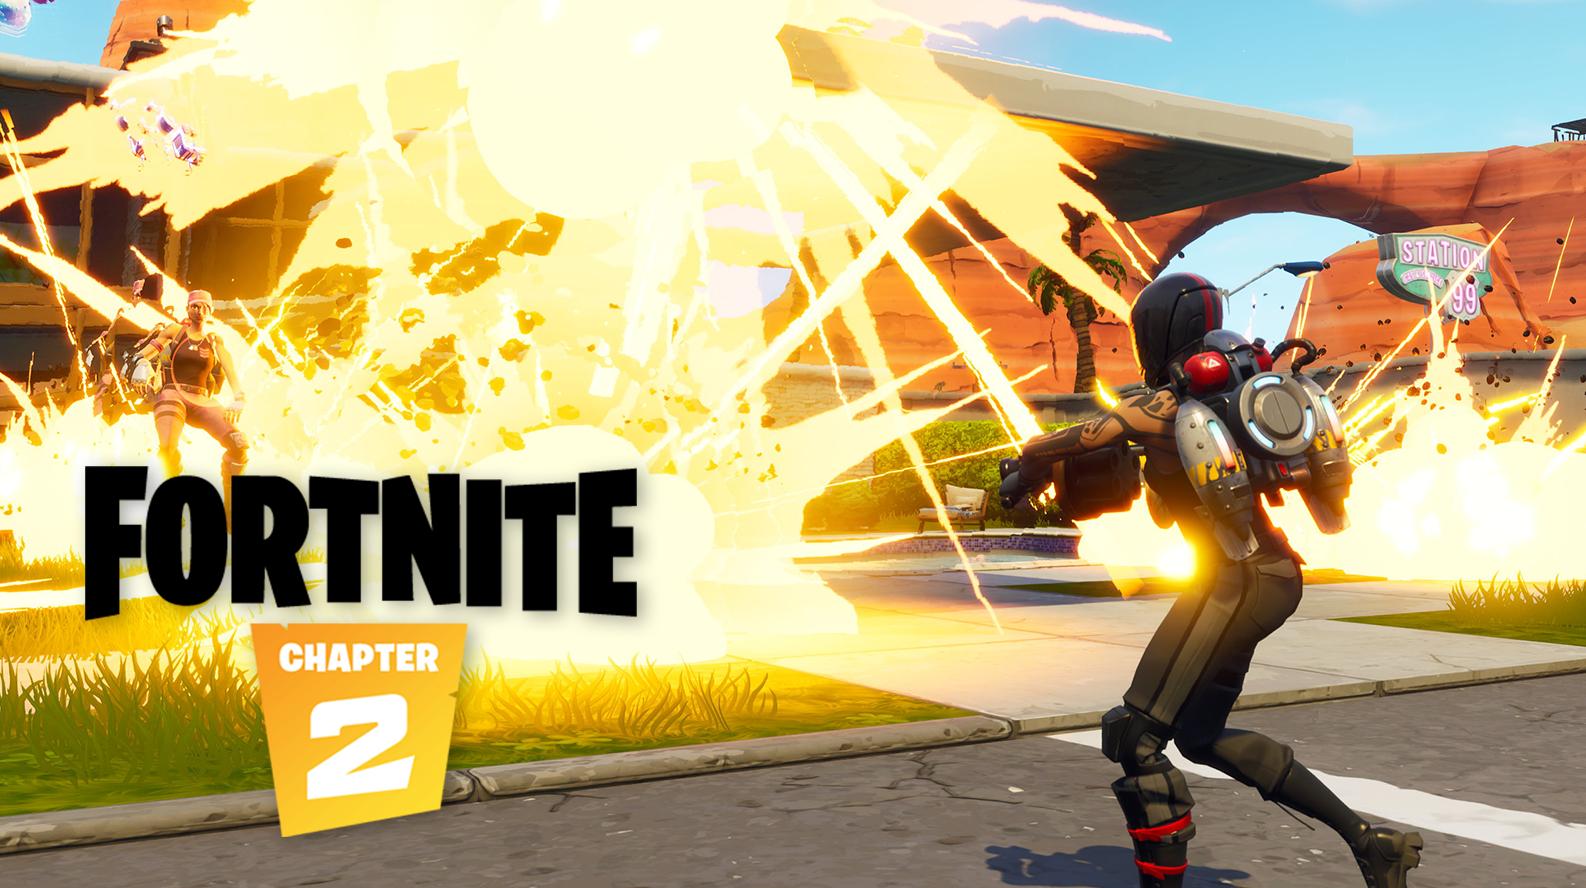 Fortnite explosions